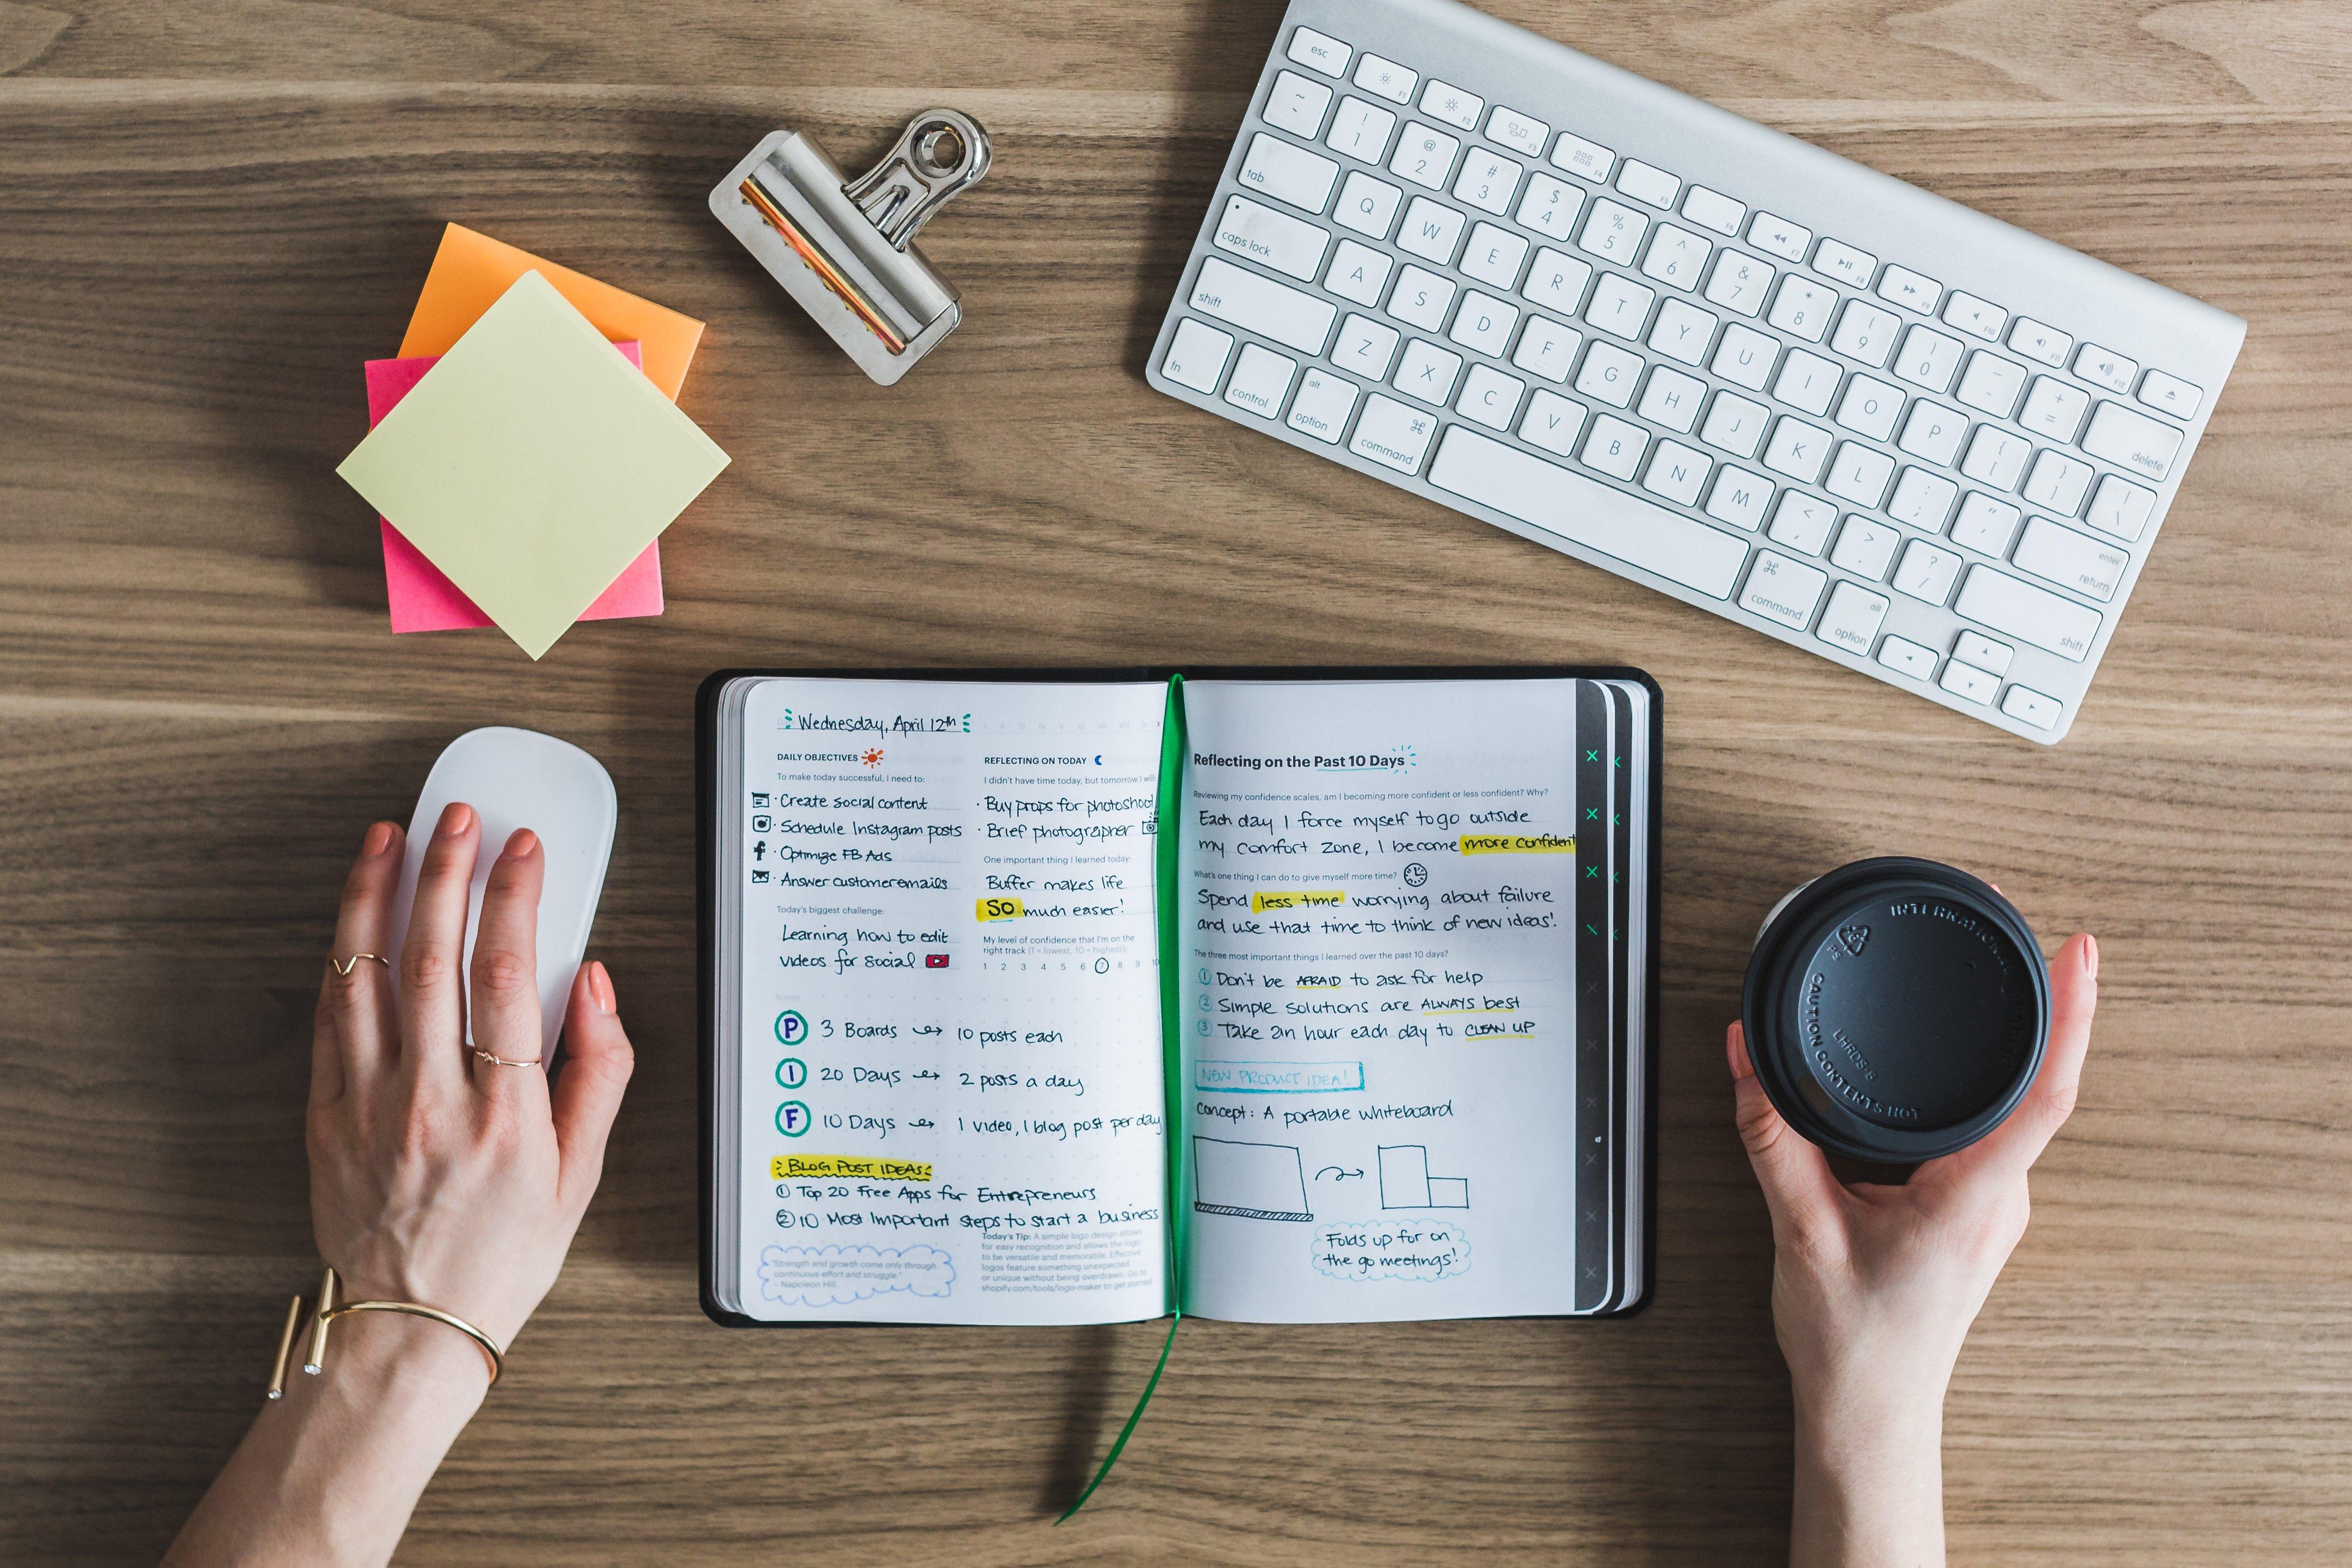 Lowongan Kerja Gaji 5 Juta Di Jogja Terbaru Mamikos Info